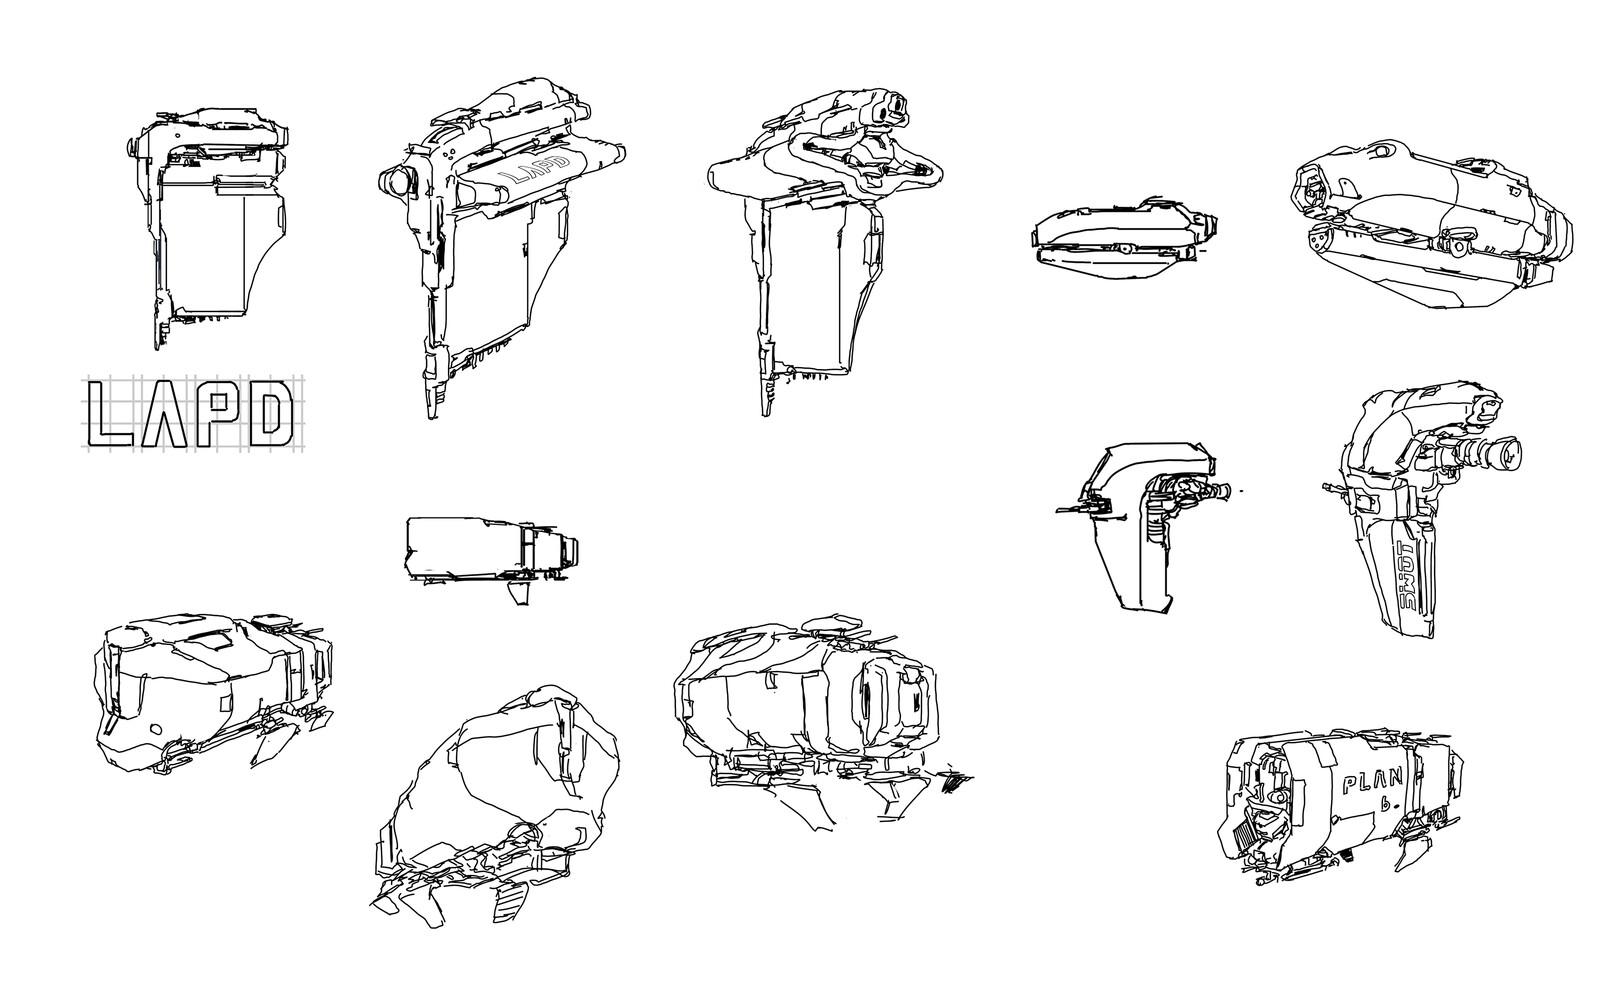 random ship doodle 2